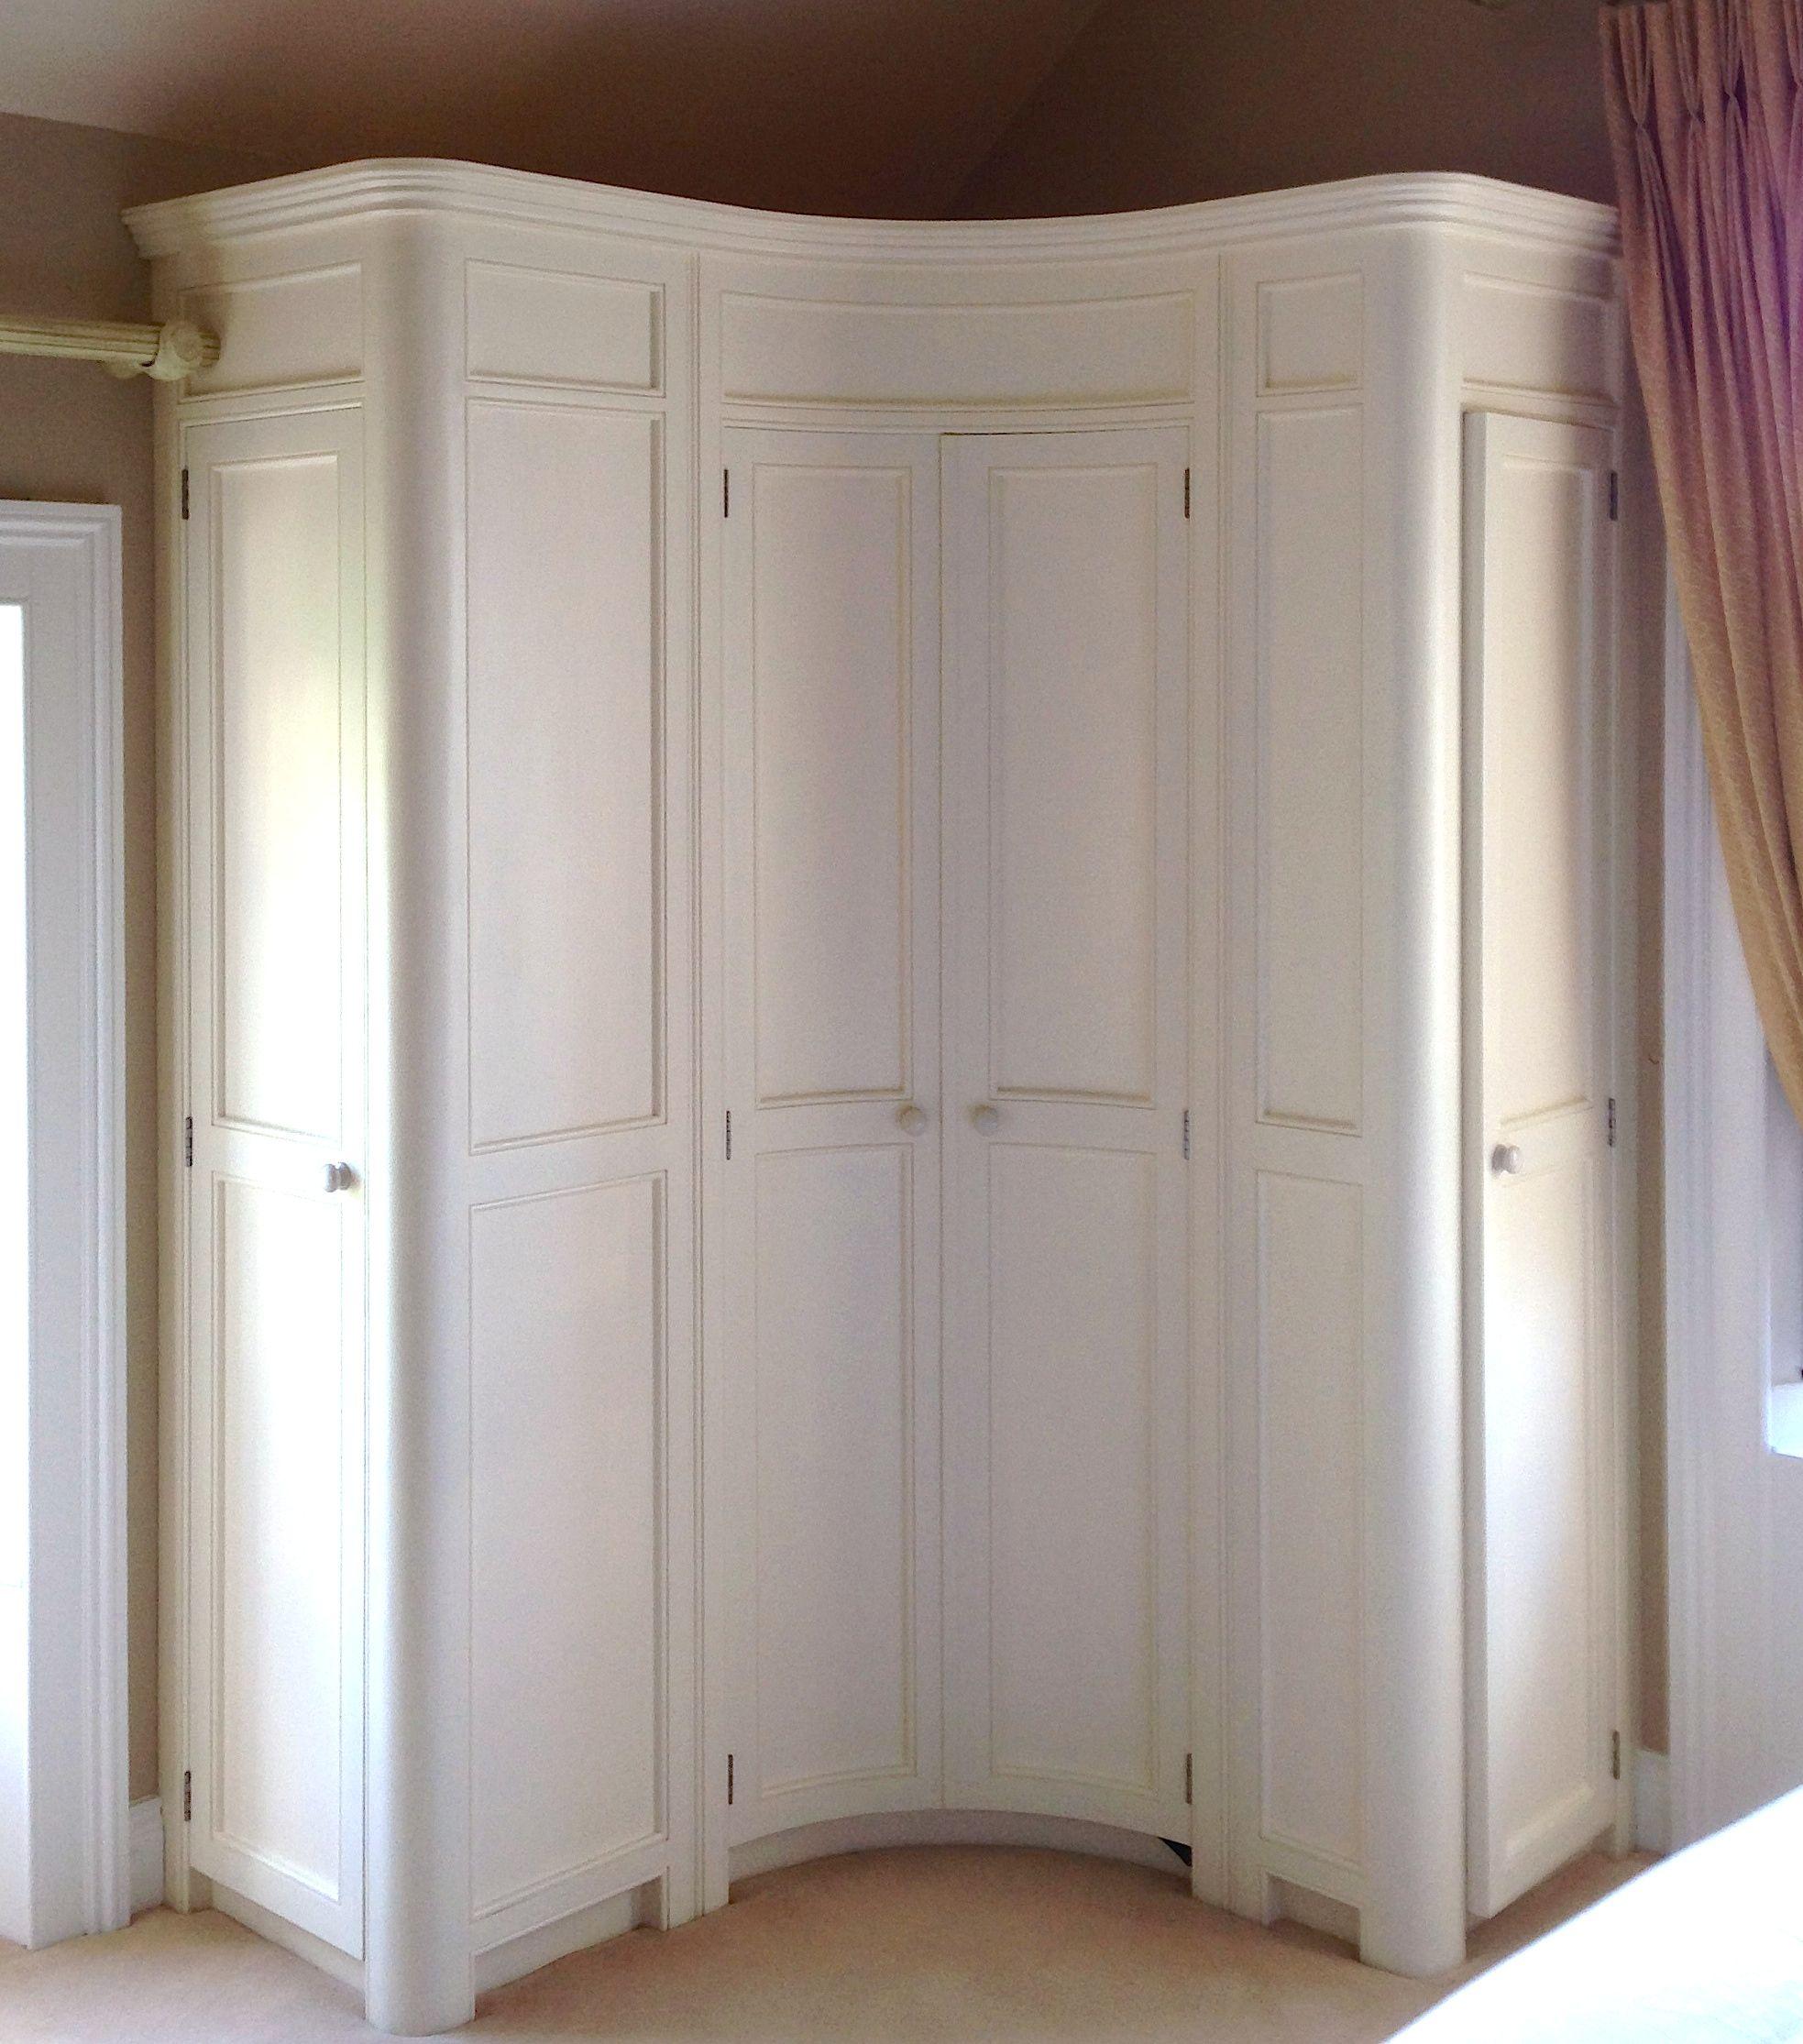 znalezione obrazy dla zapytania corner wardrobe ikea furniture pinterest corner wardrobe. Black Bedroom Furniture Sets. Home Design Ideas